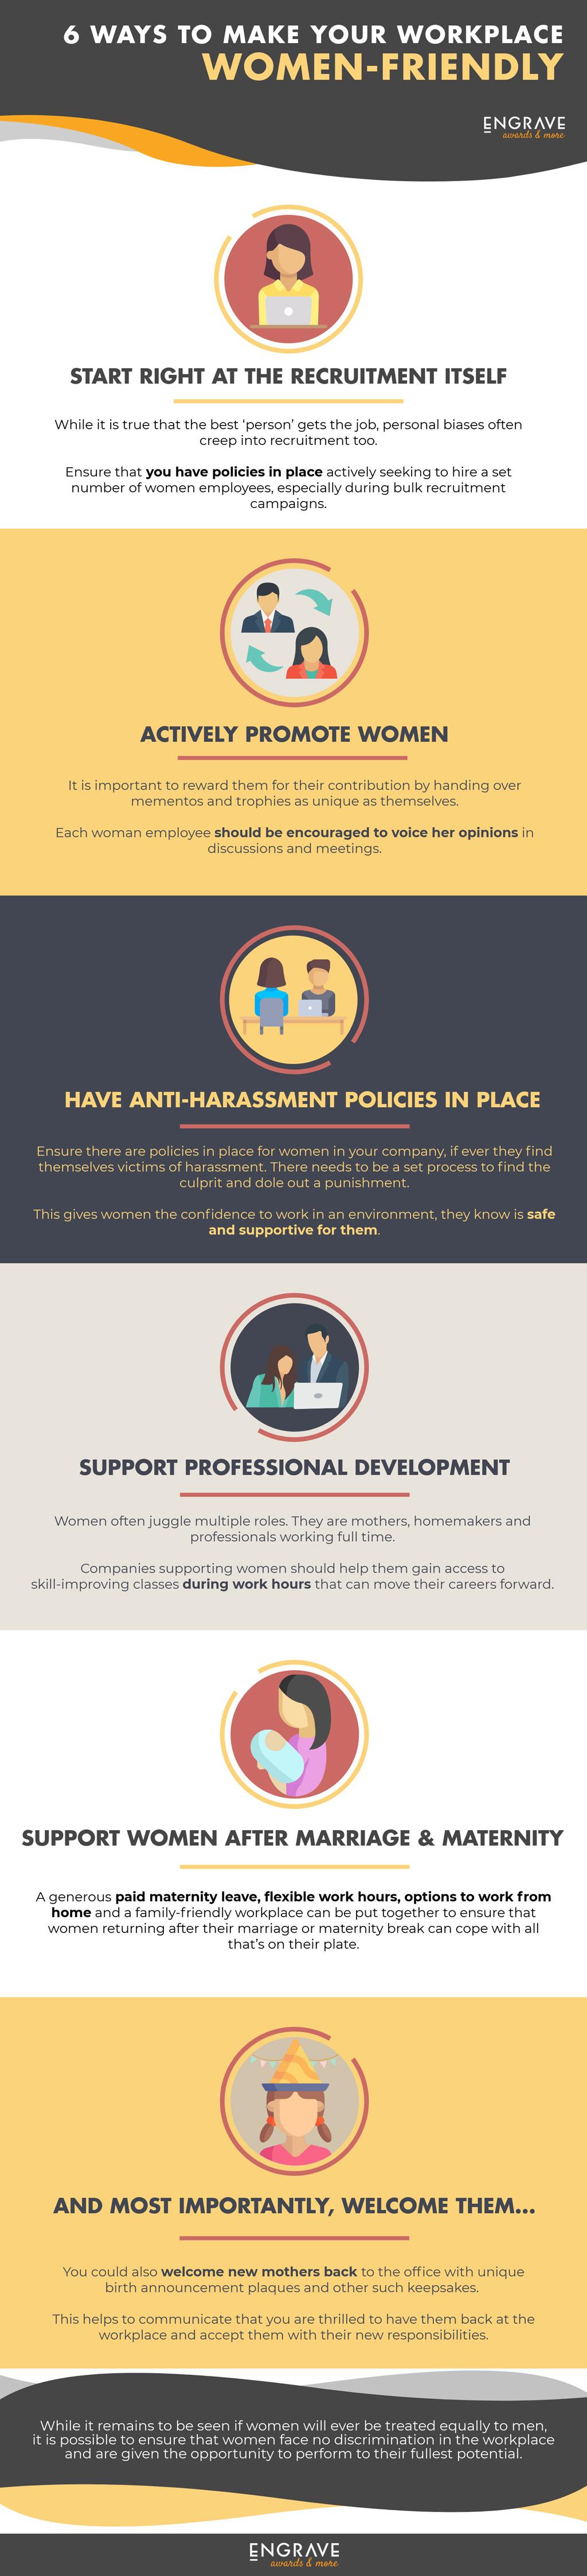 ways-to-make-women-friendly-workplaces.jpg